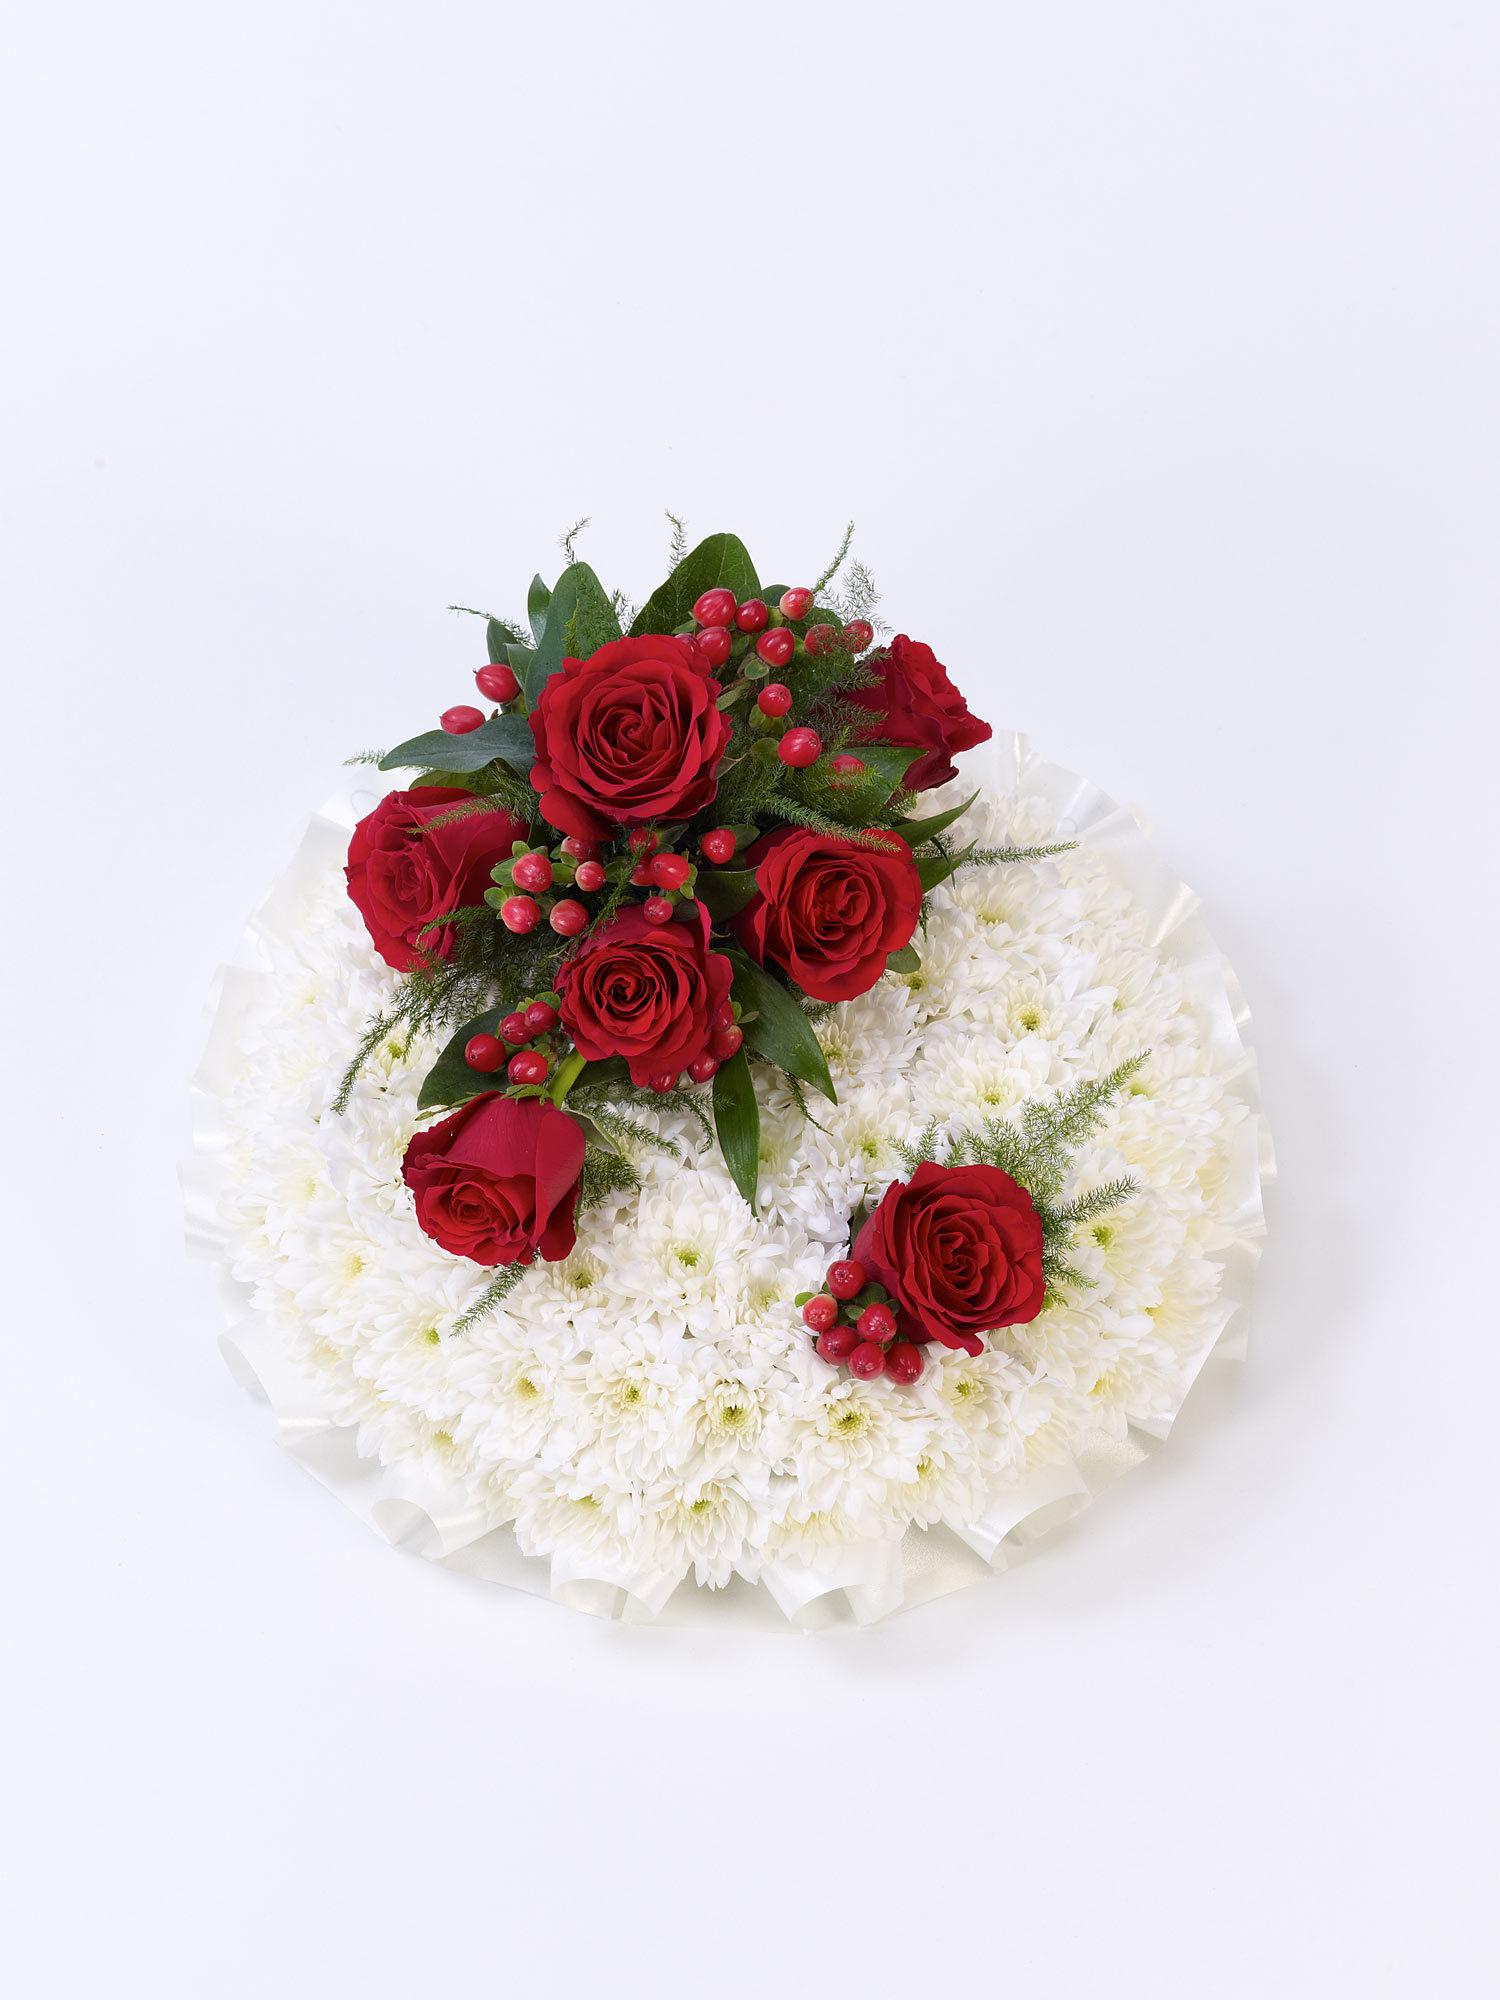 Posy Cooks the florist